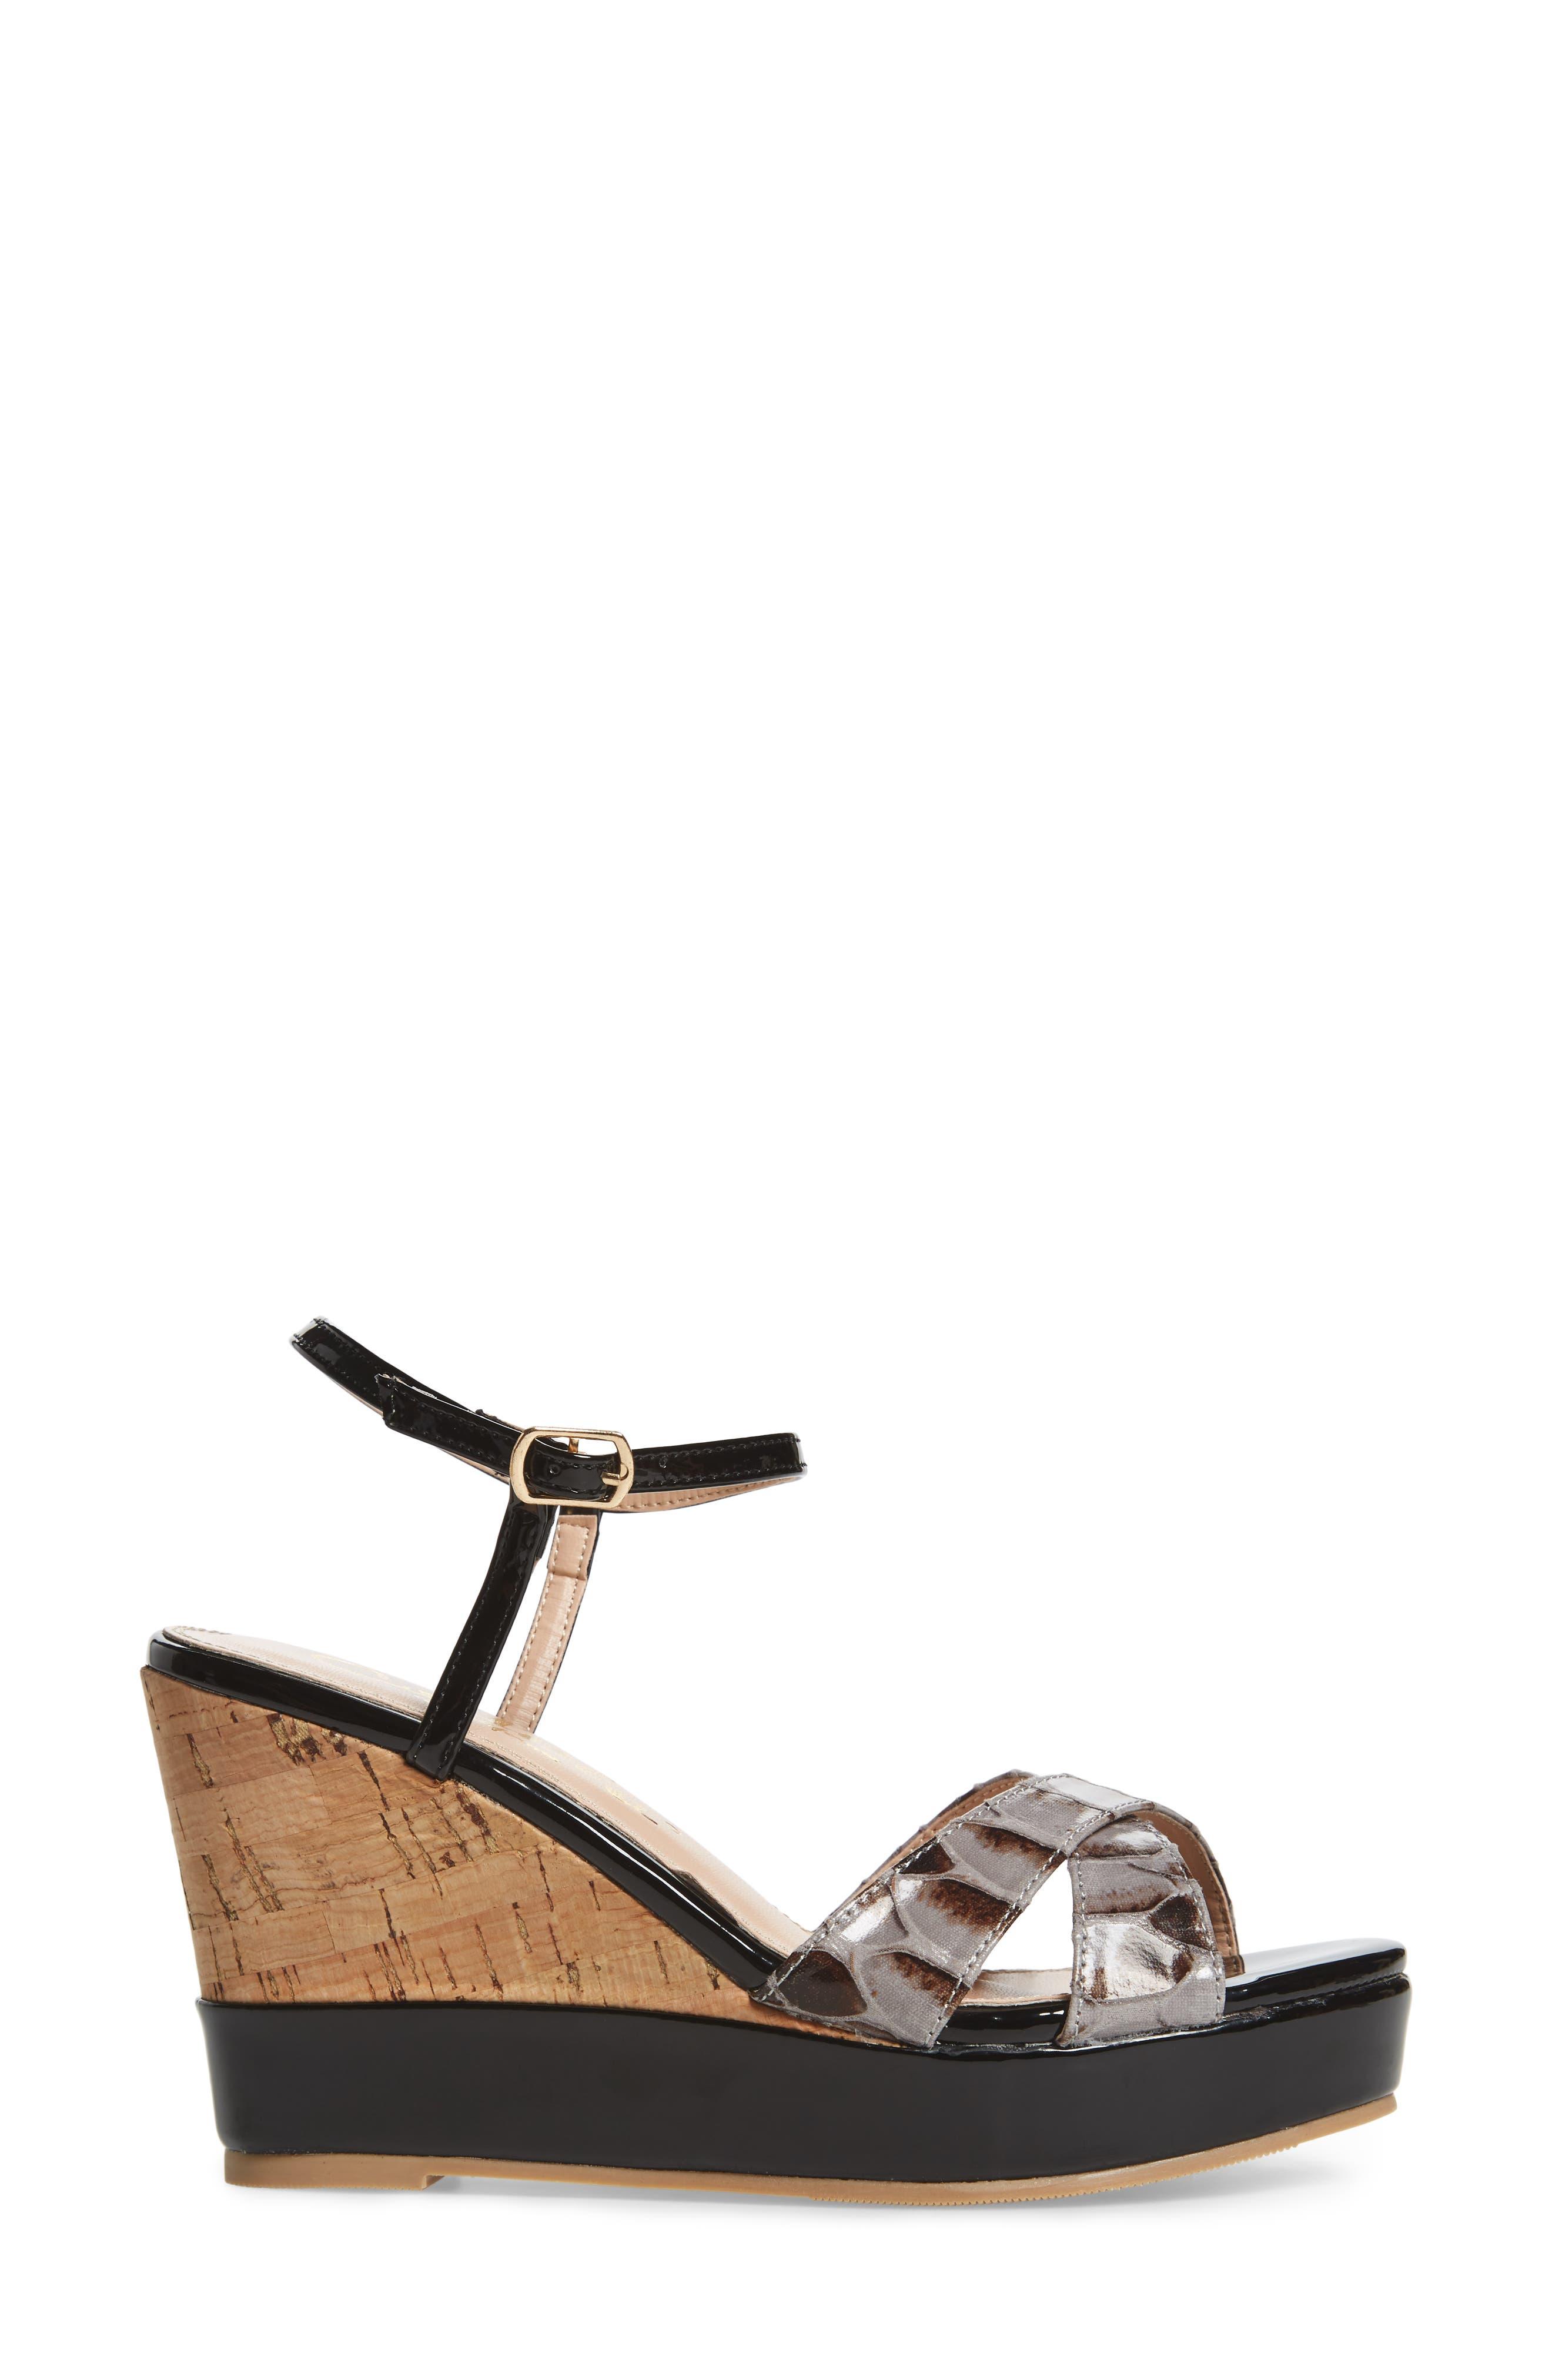 Lottie Platform Wedge Sandal,                             Alternate thumbnail 3, color,                             001